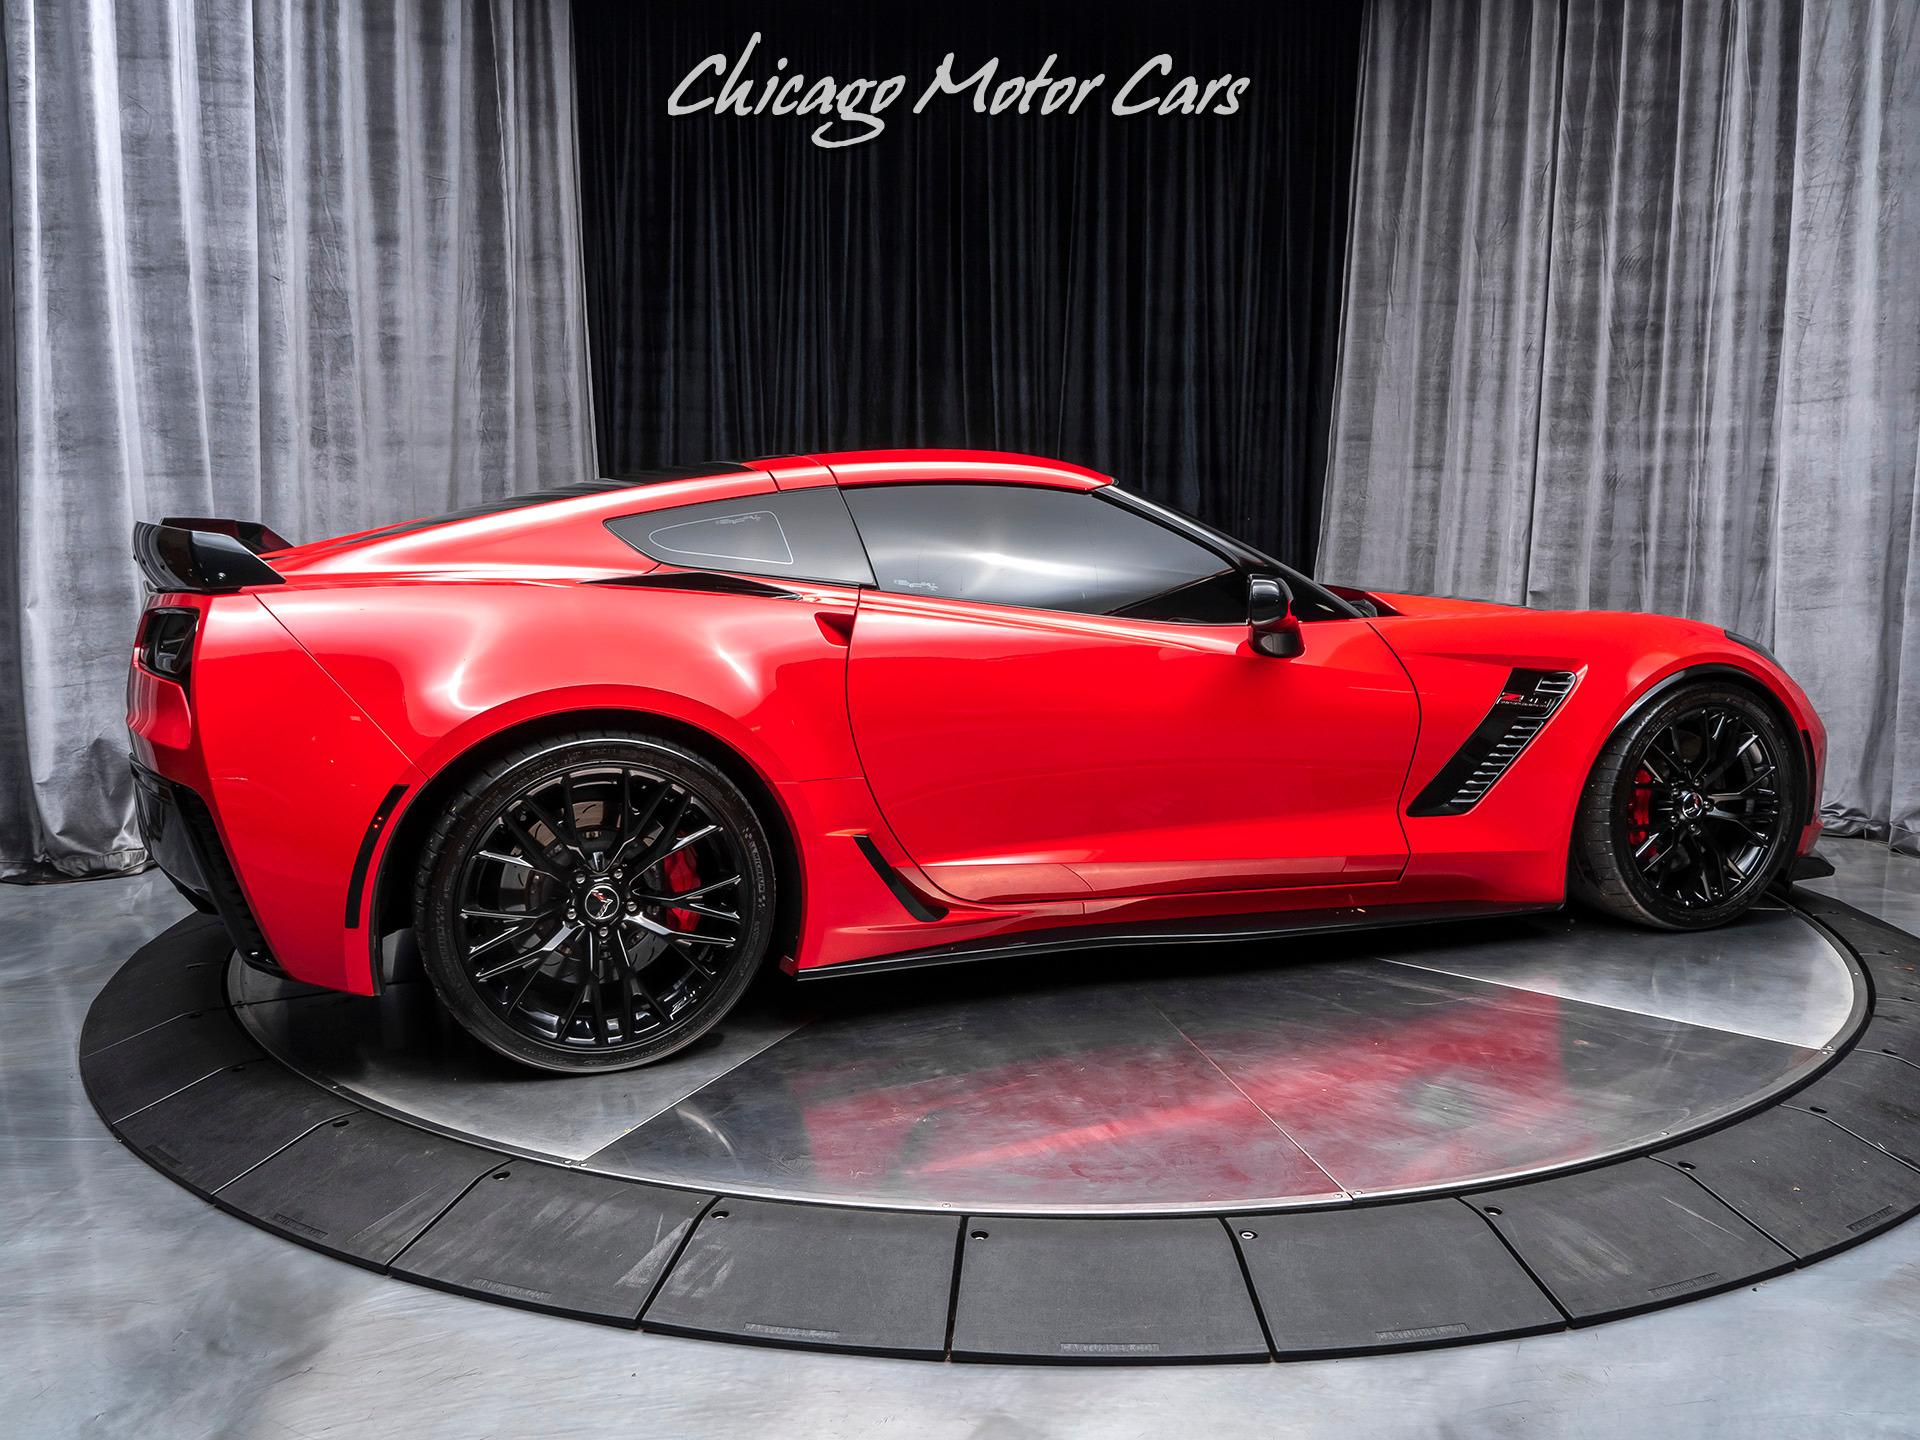 Used 2015 Chevrolet Corvette Z06 3LZ MSRP $97,060+ For Sale